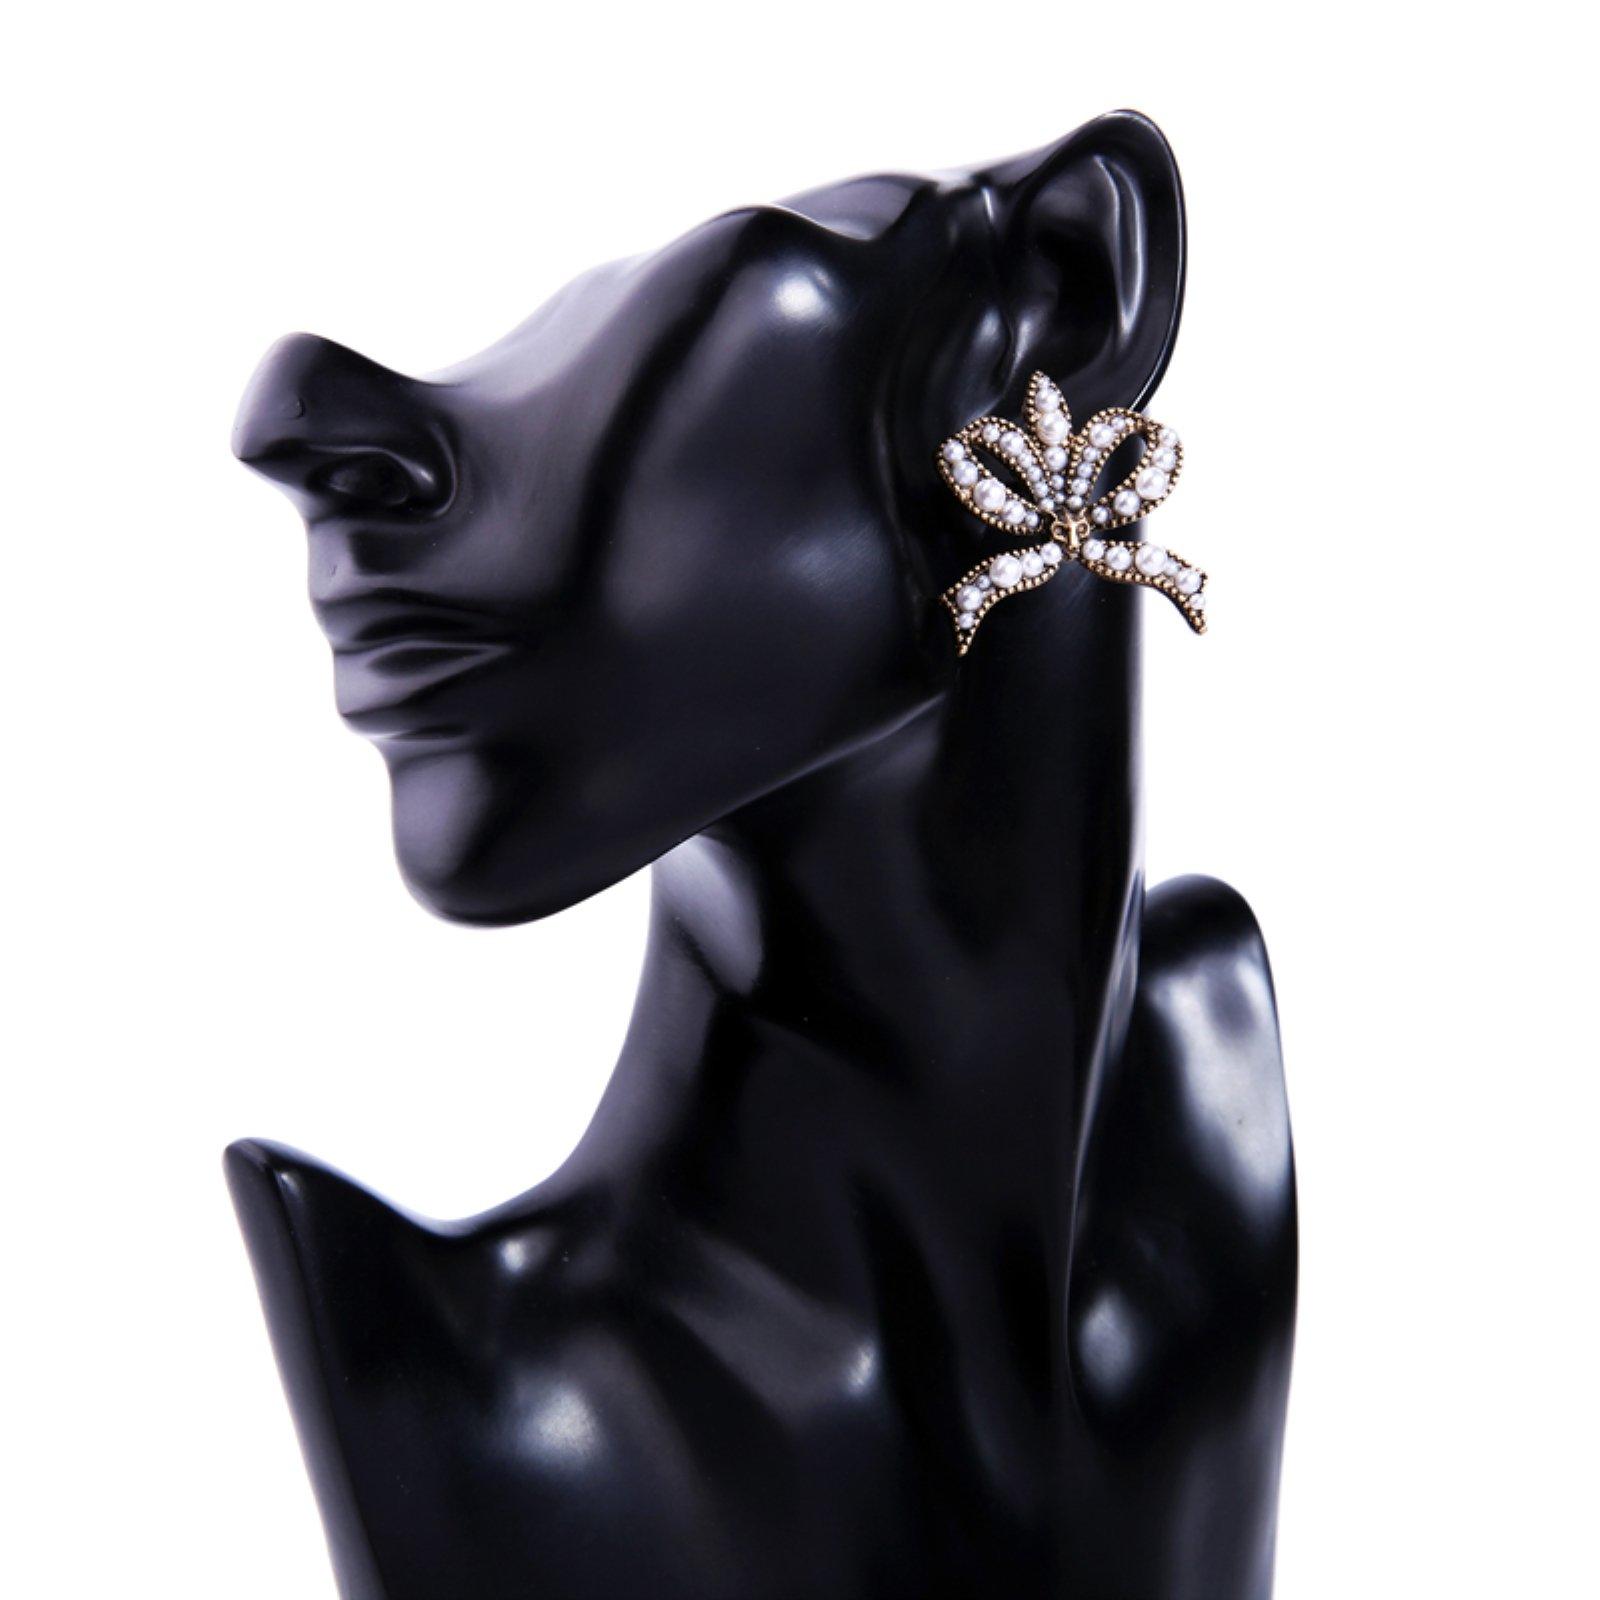 ptk12 Simulated Pearl Bowknot Earrings Fashion Jewelry Fox Animal Design Vintage Big Stud Earrings Wholesale